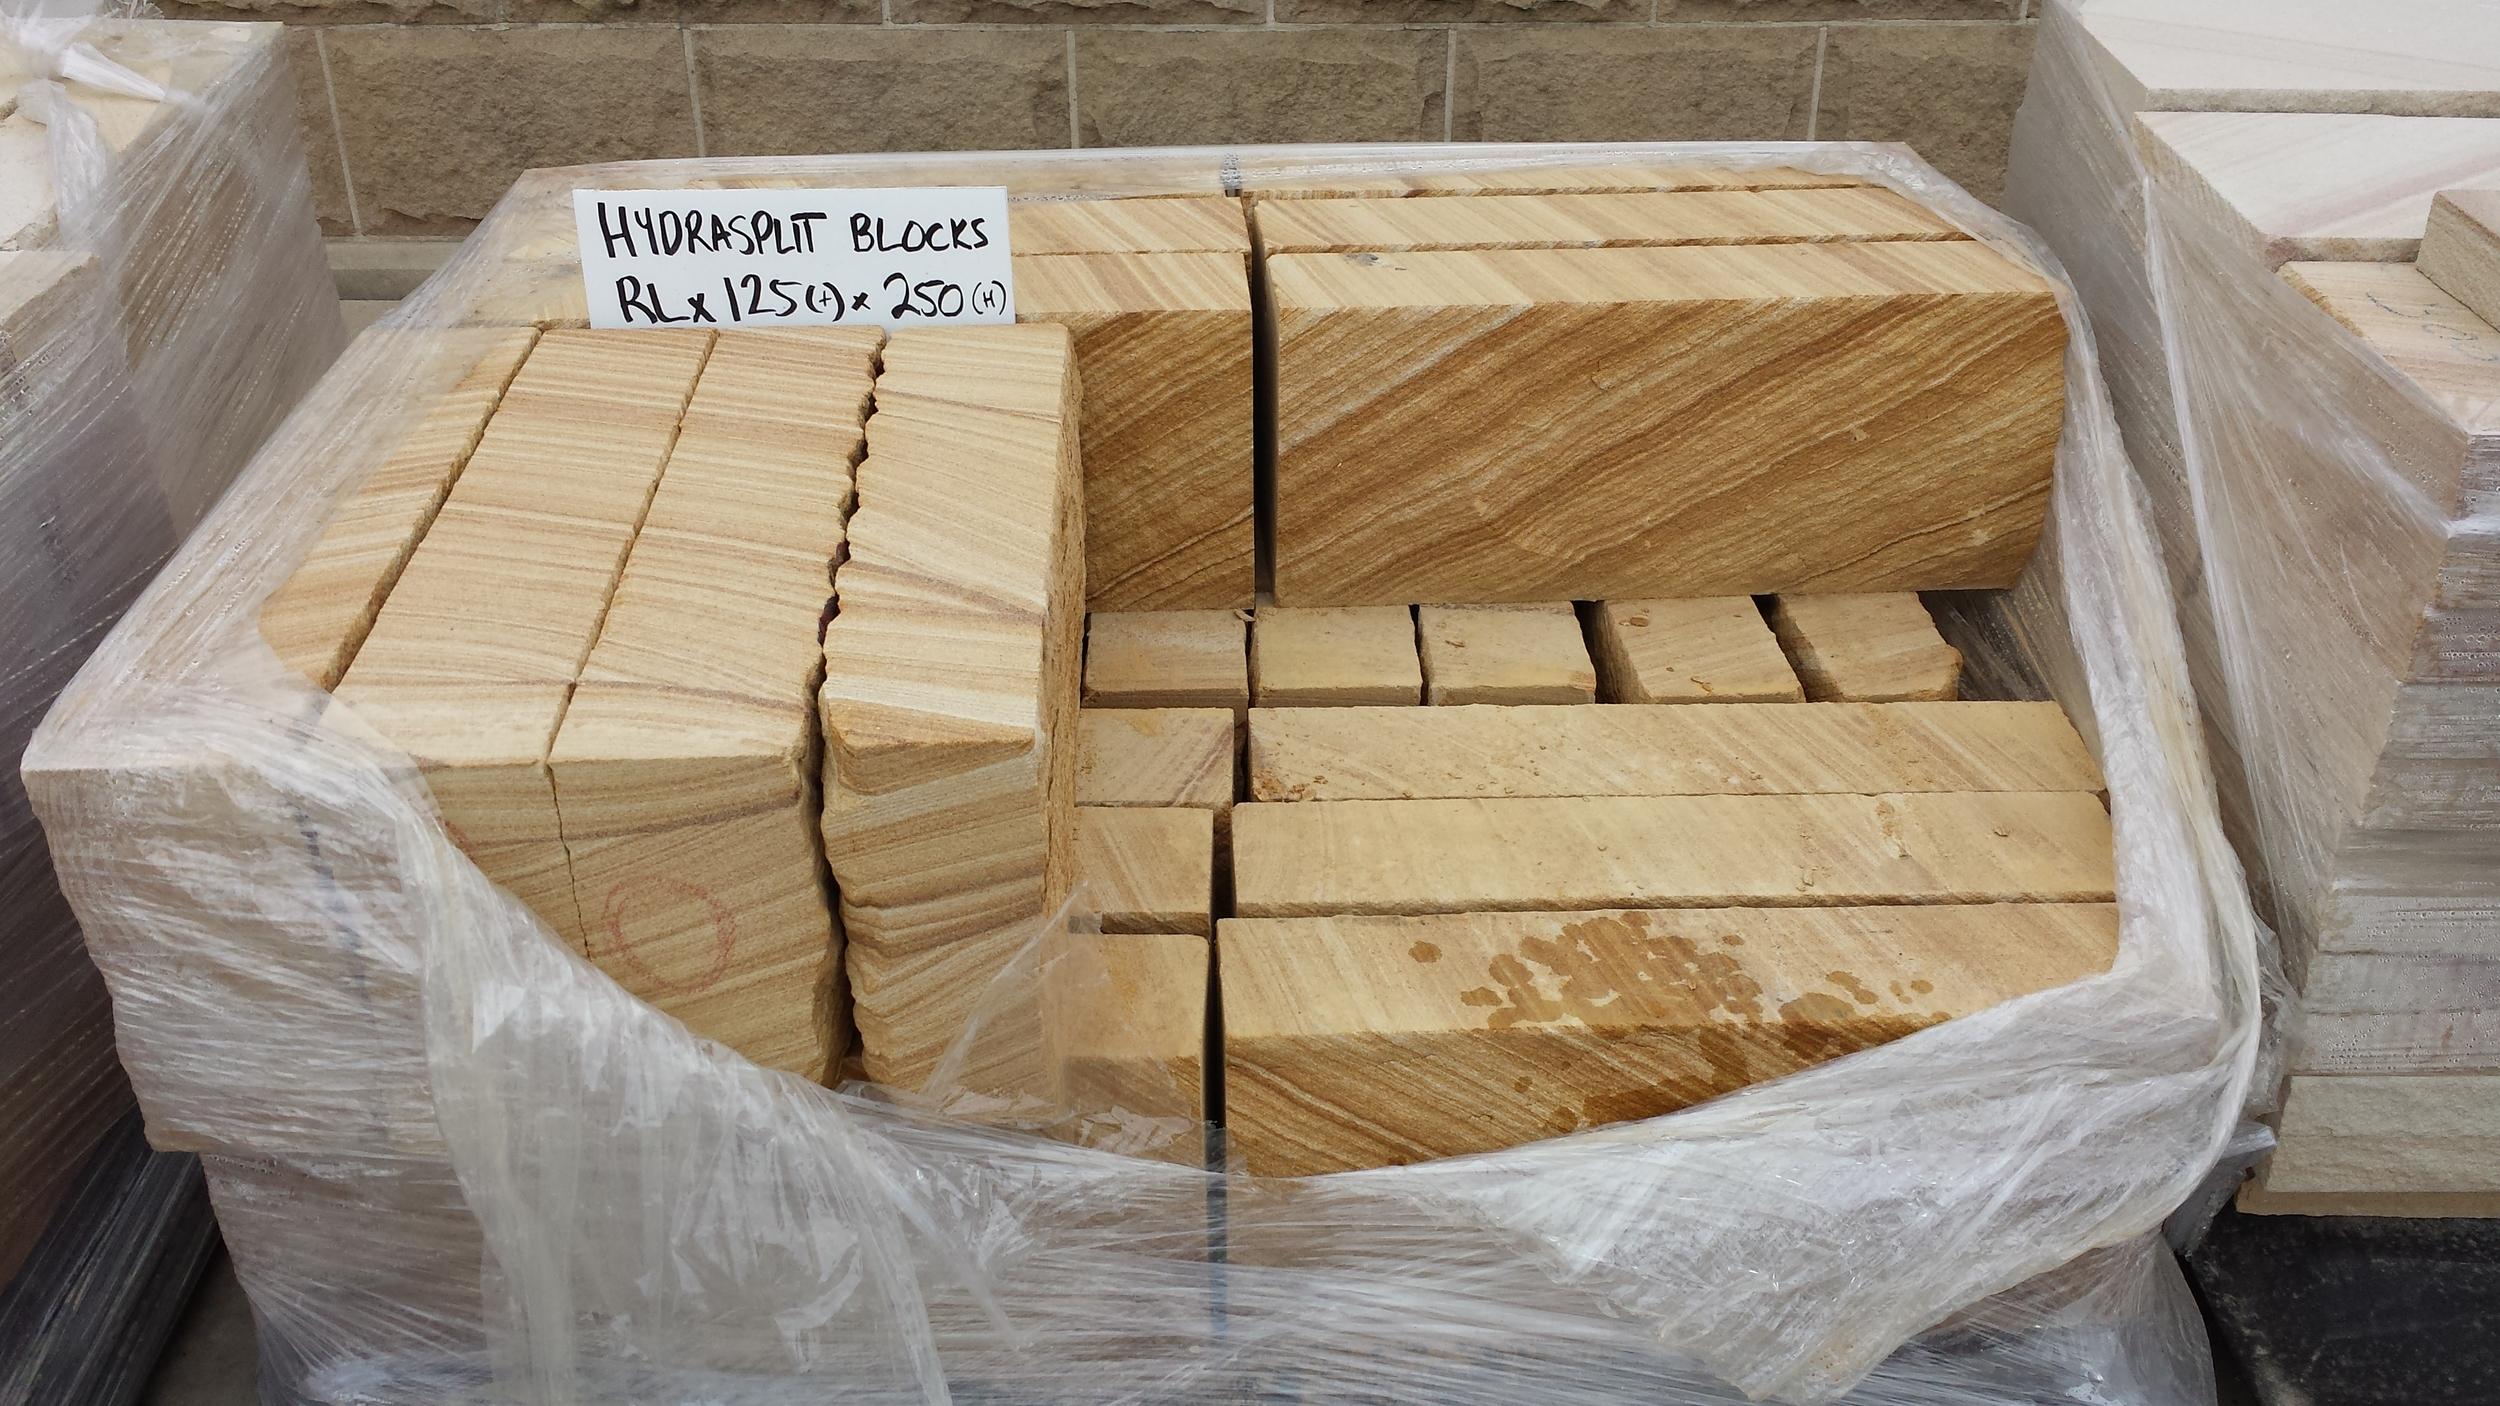 Hydrasplit blocks - Stock items  (4).jpg